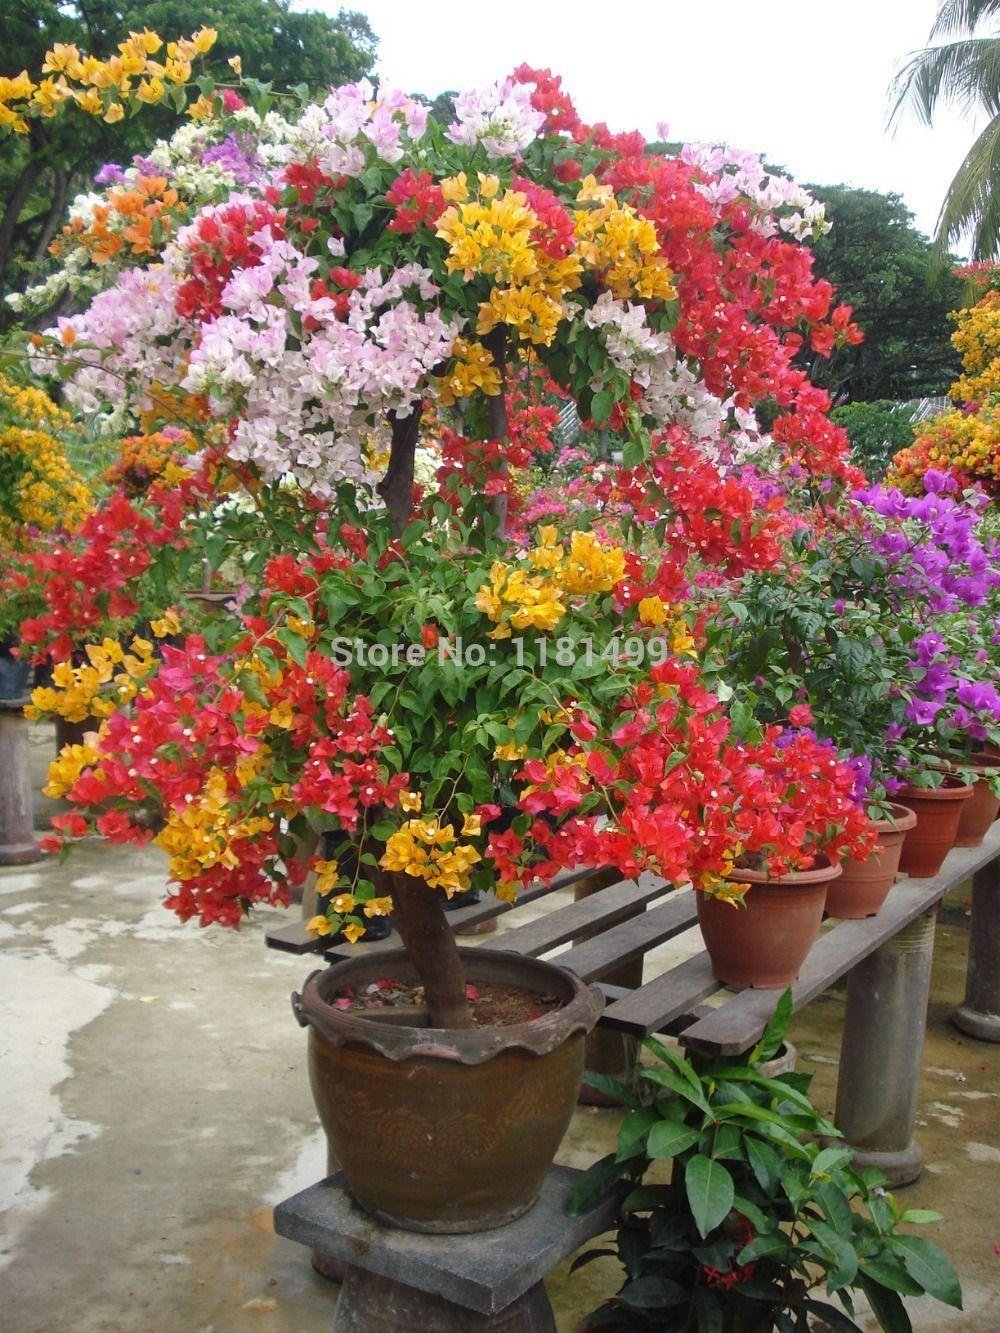 Buganvilla en maceta ideas para el exterior flores for Arbustos para macetas exterior